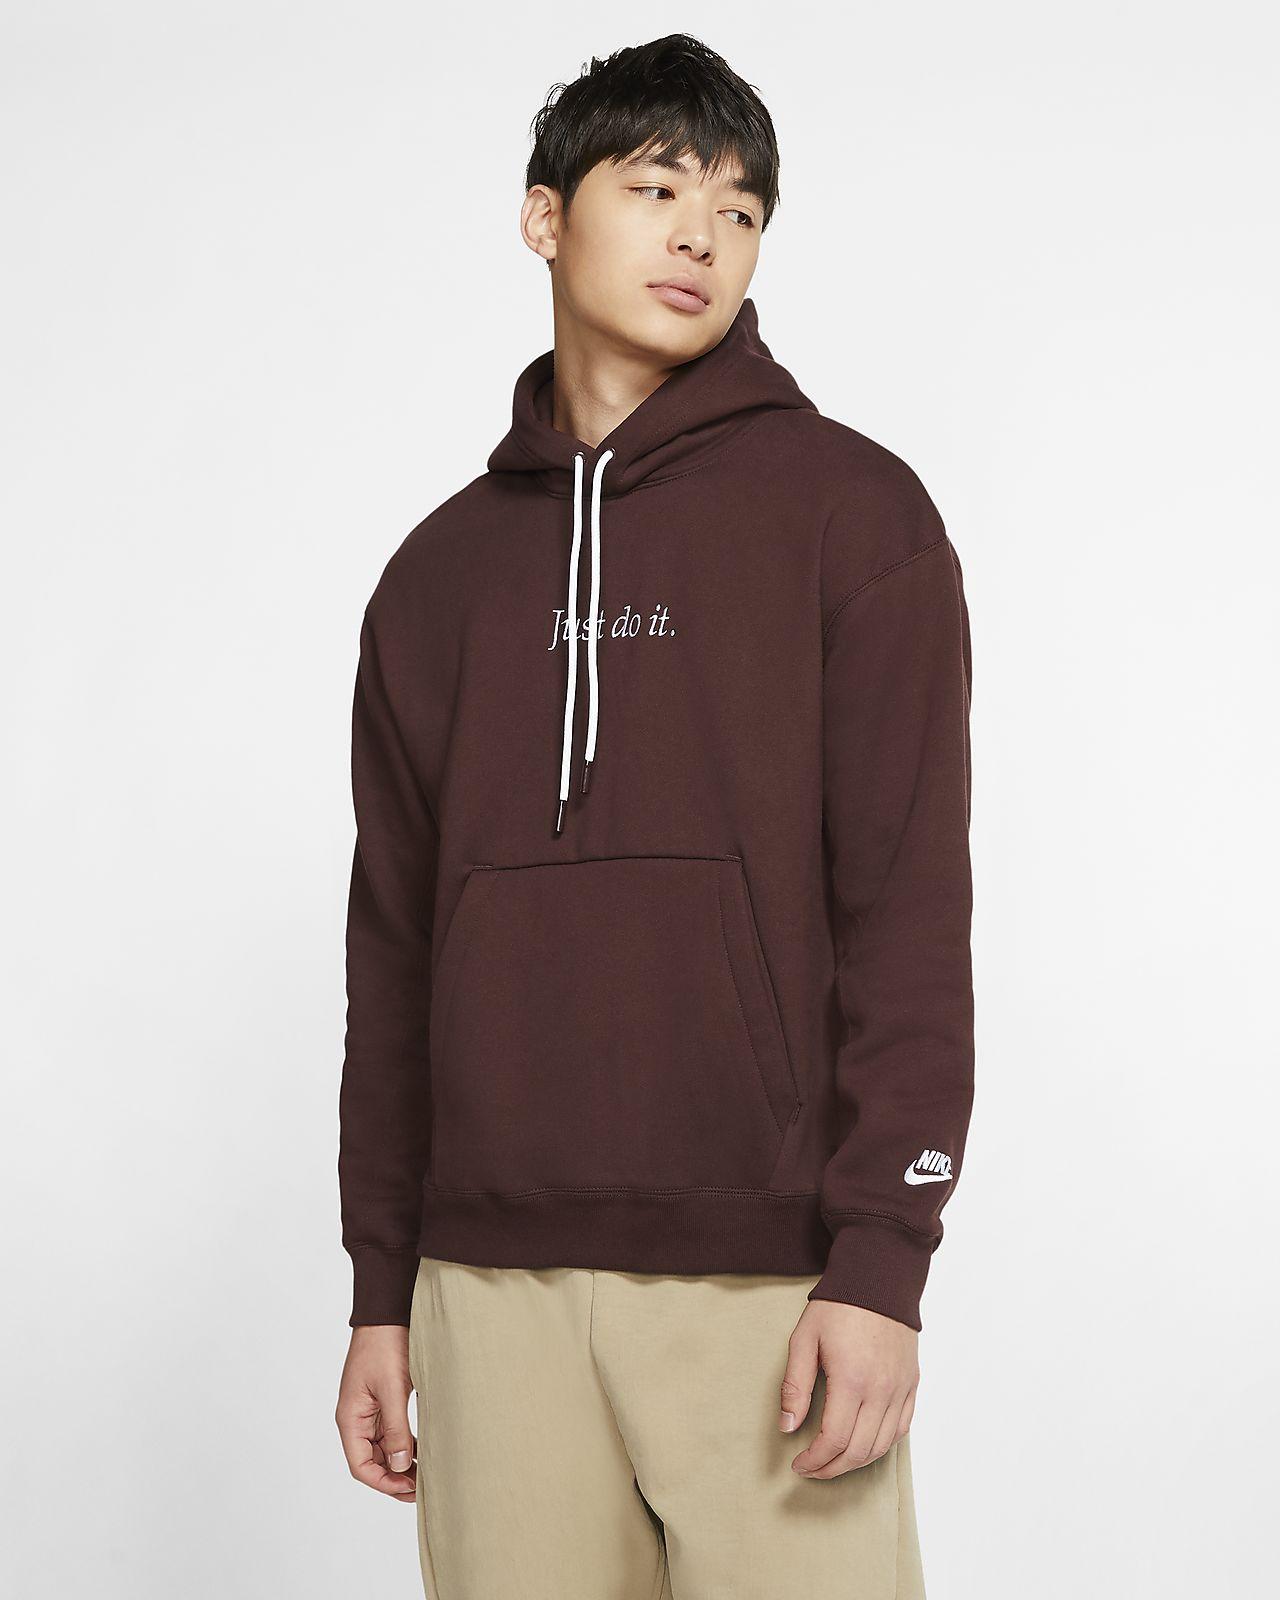 Sportswear Hoodies & Sweatshirts. Nike GB